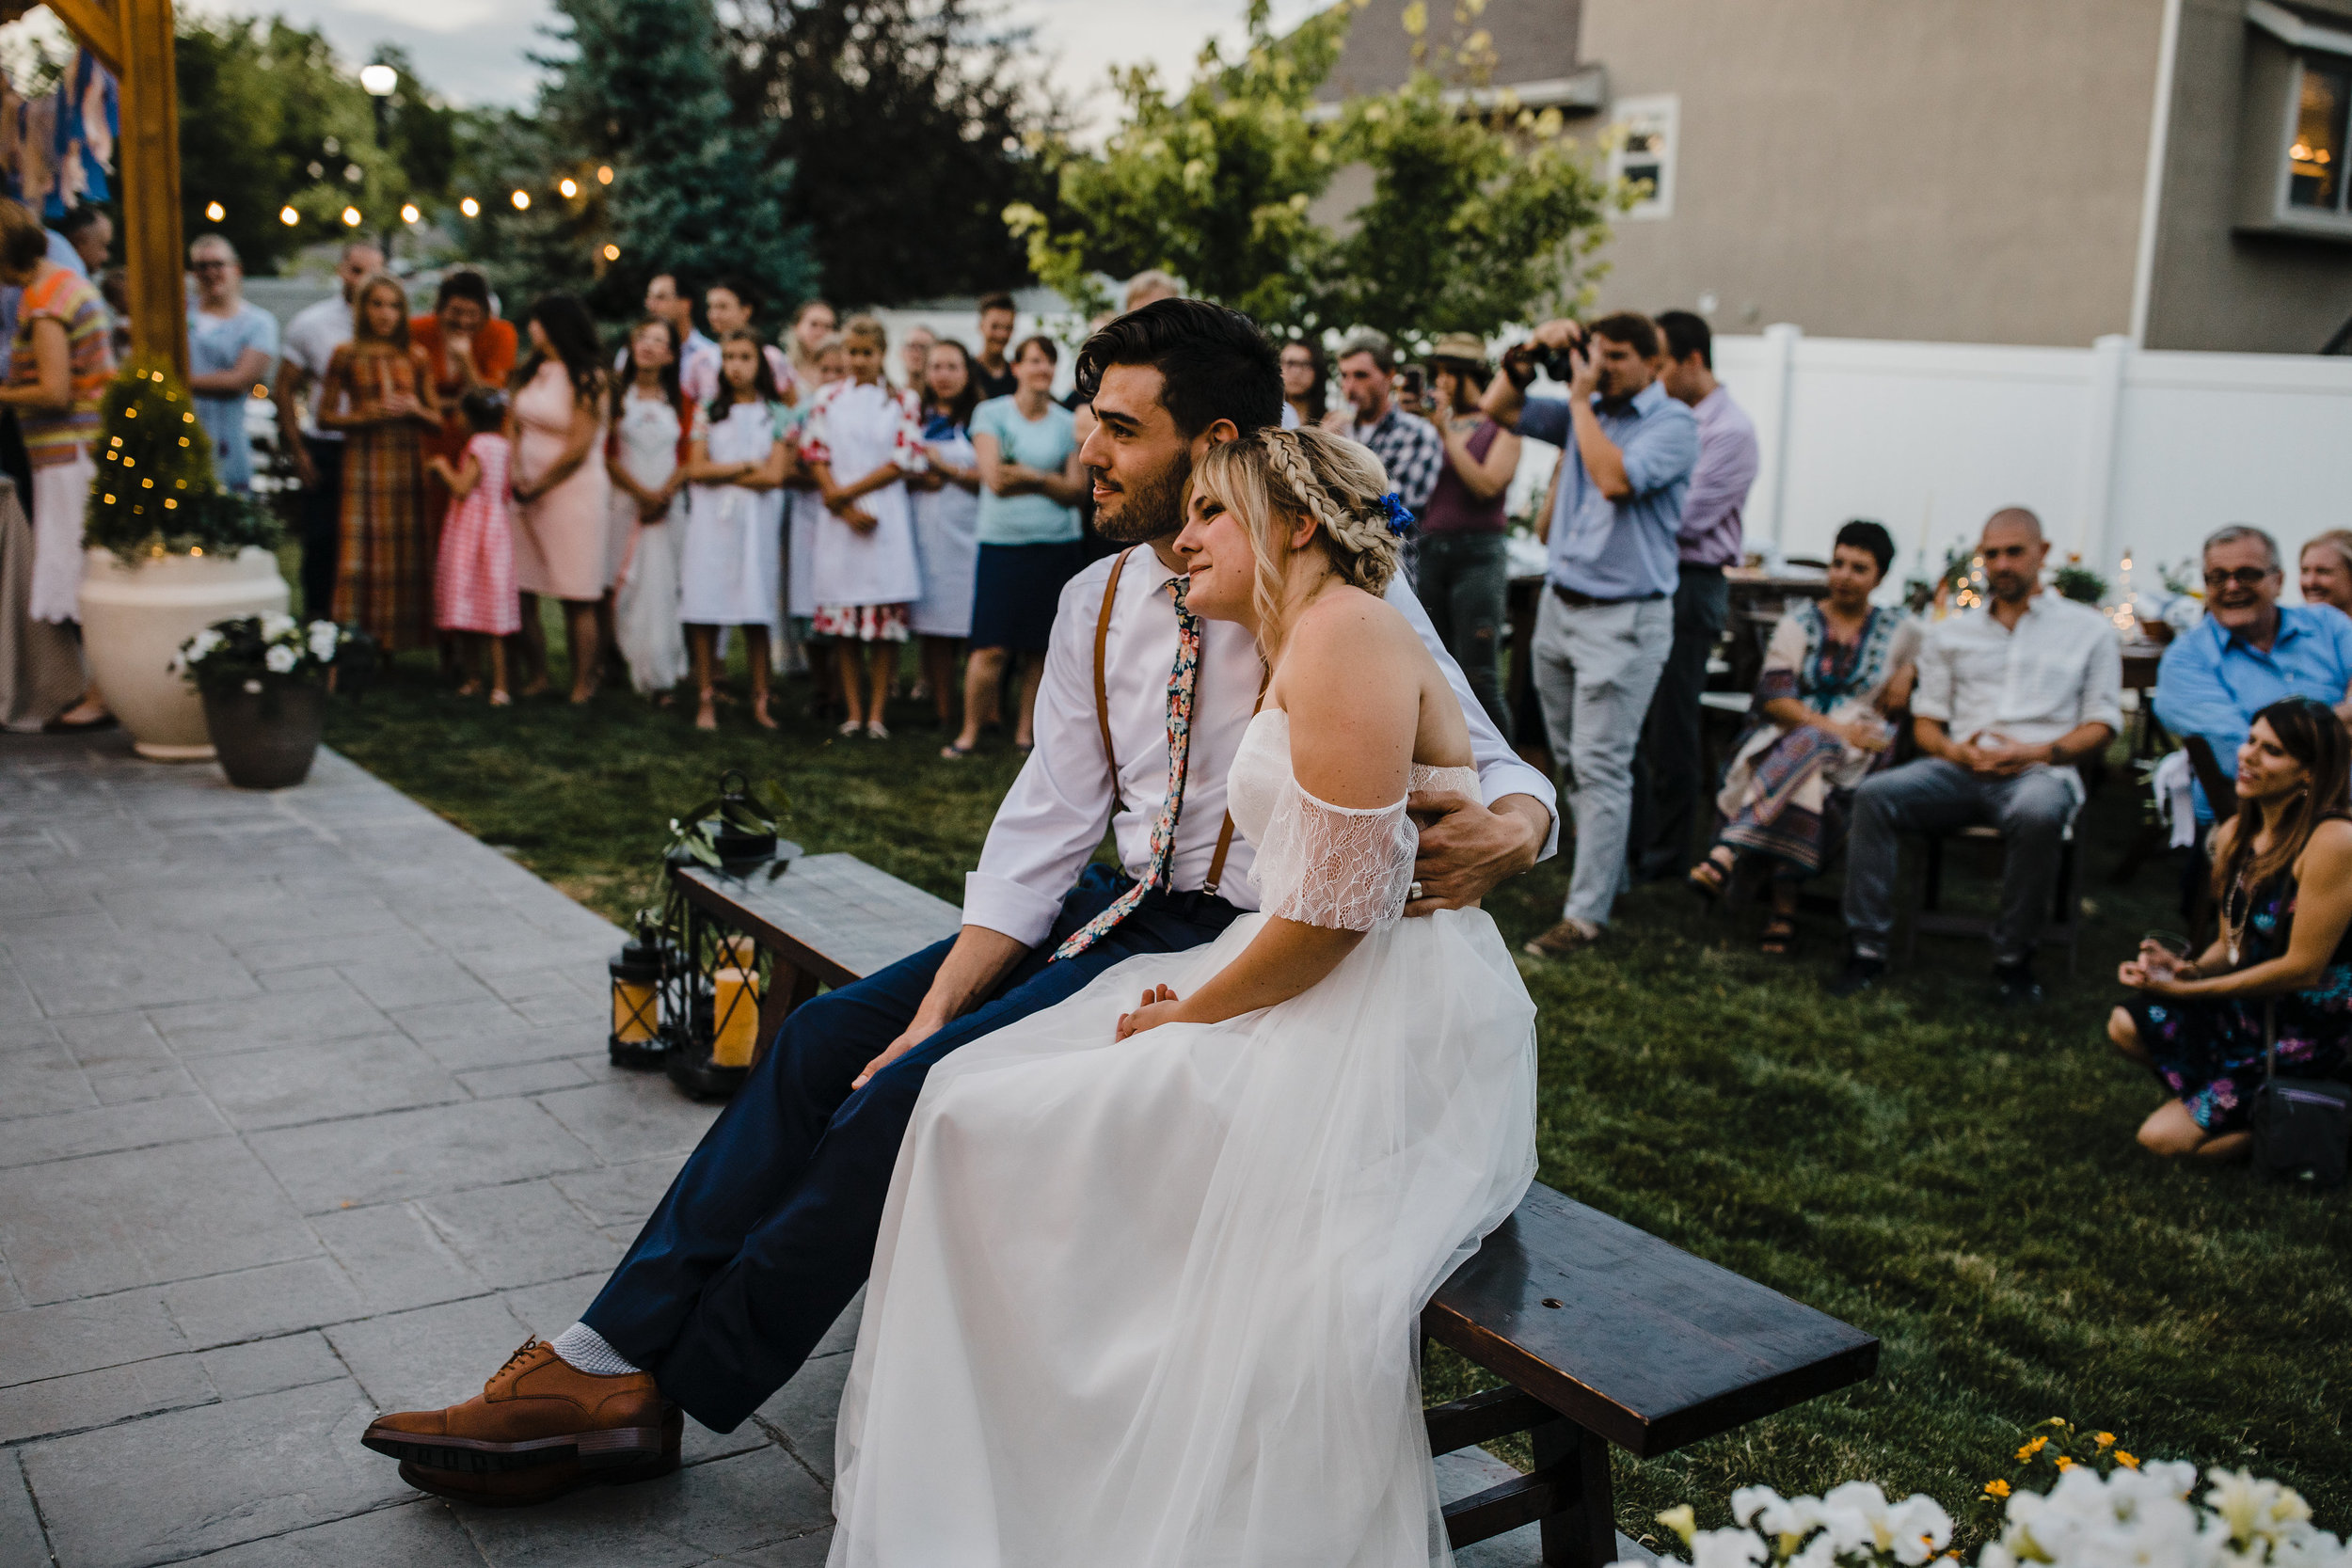 Salt lake city utah professional photographer outdoor reception string lights bride and groom romantic hugging